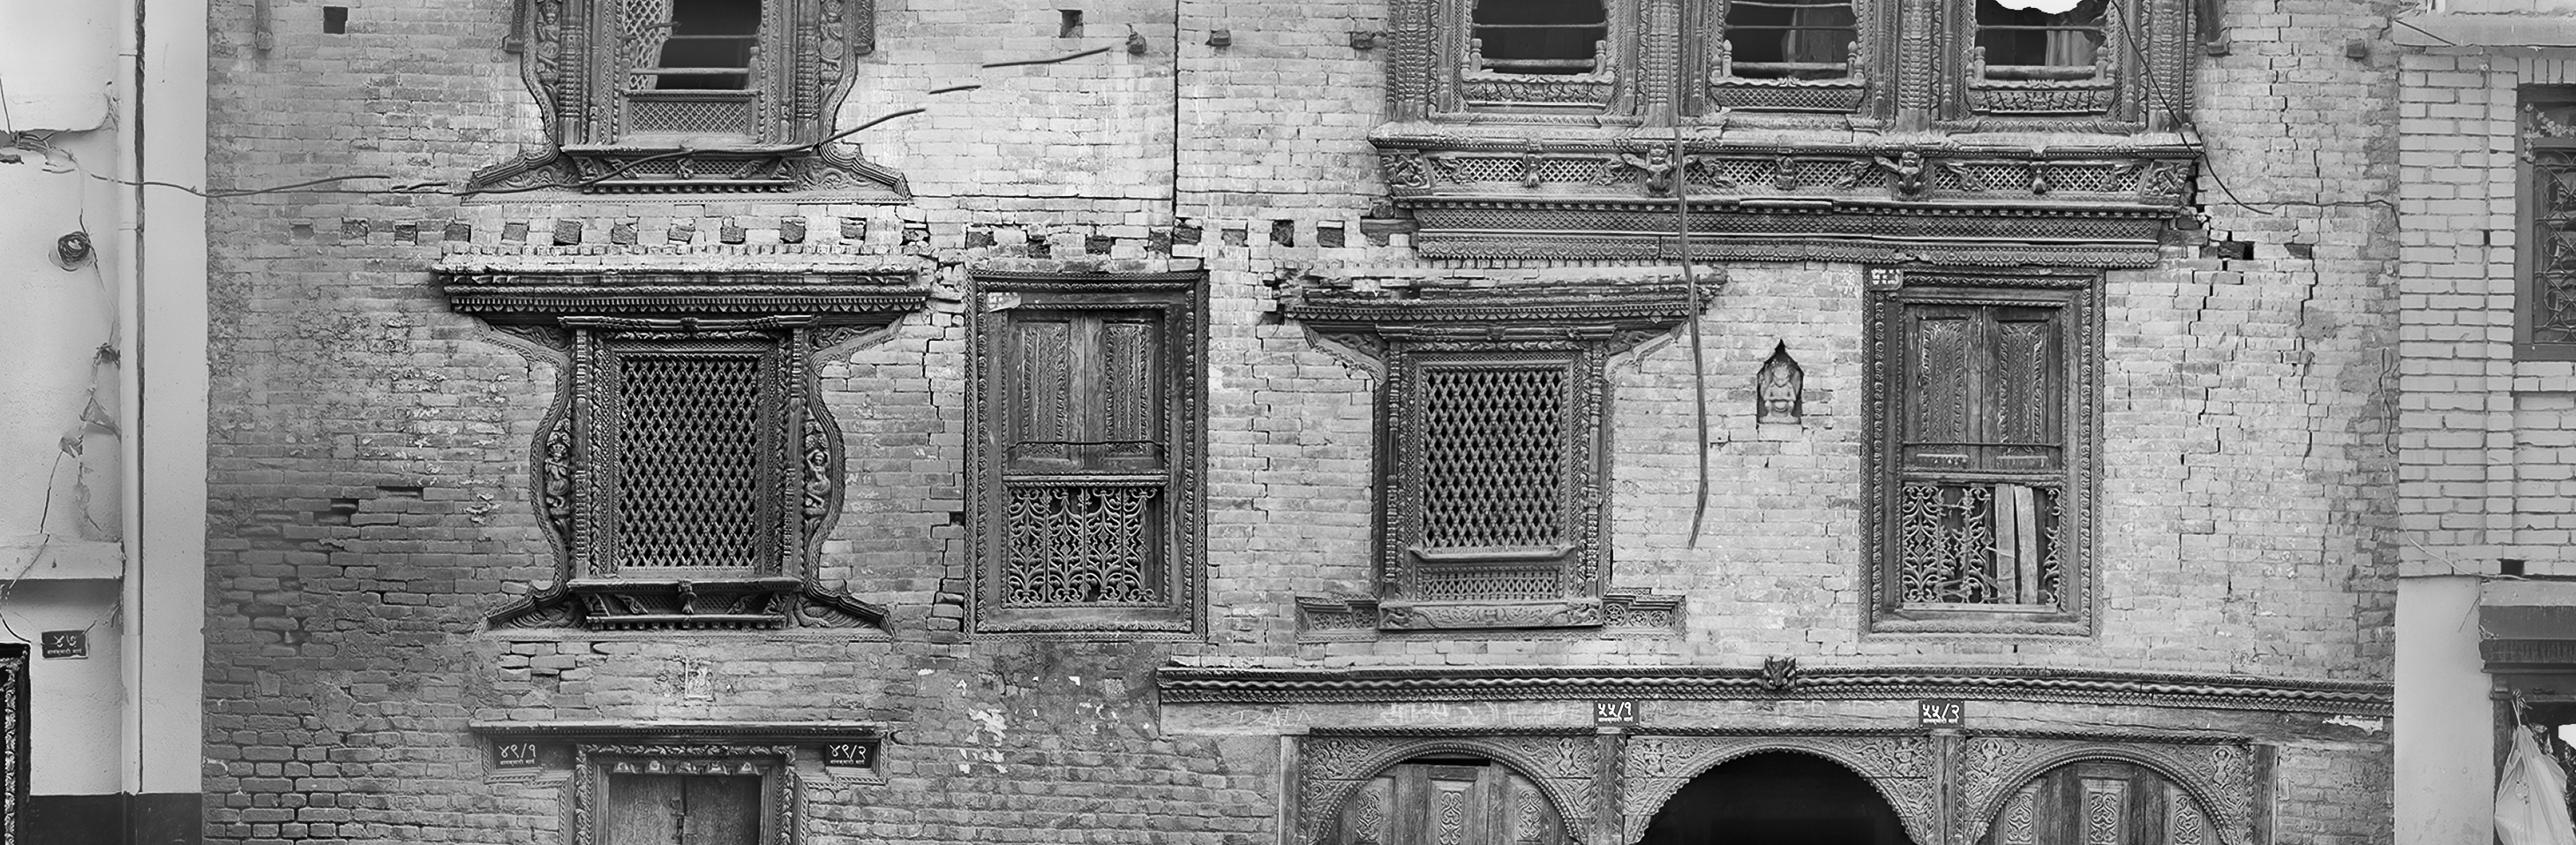 Architektur des Kathmandu-Tales – Nepal